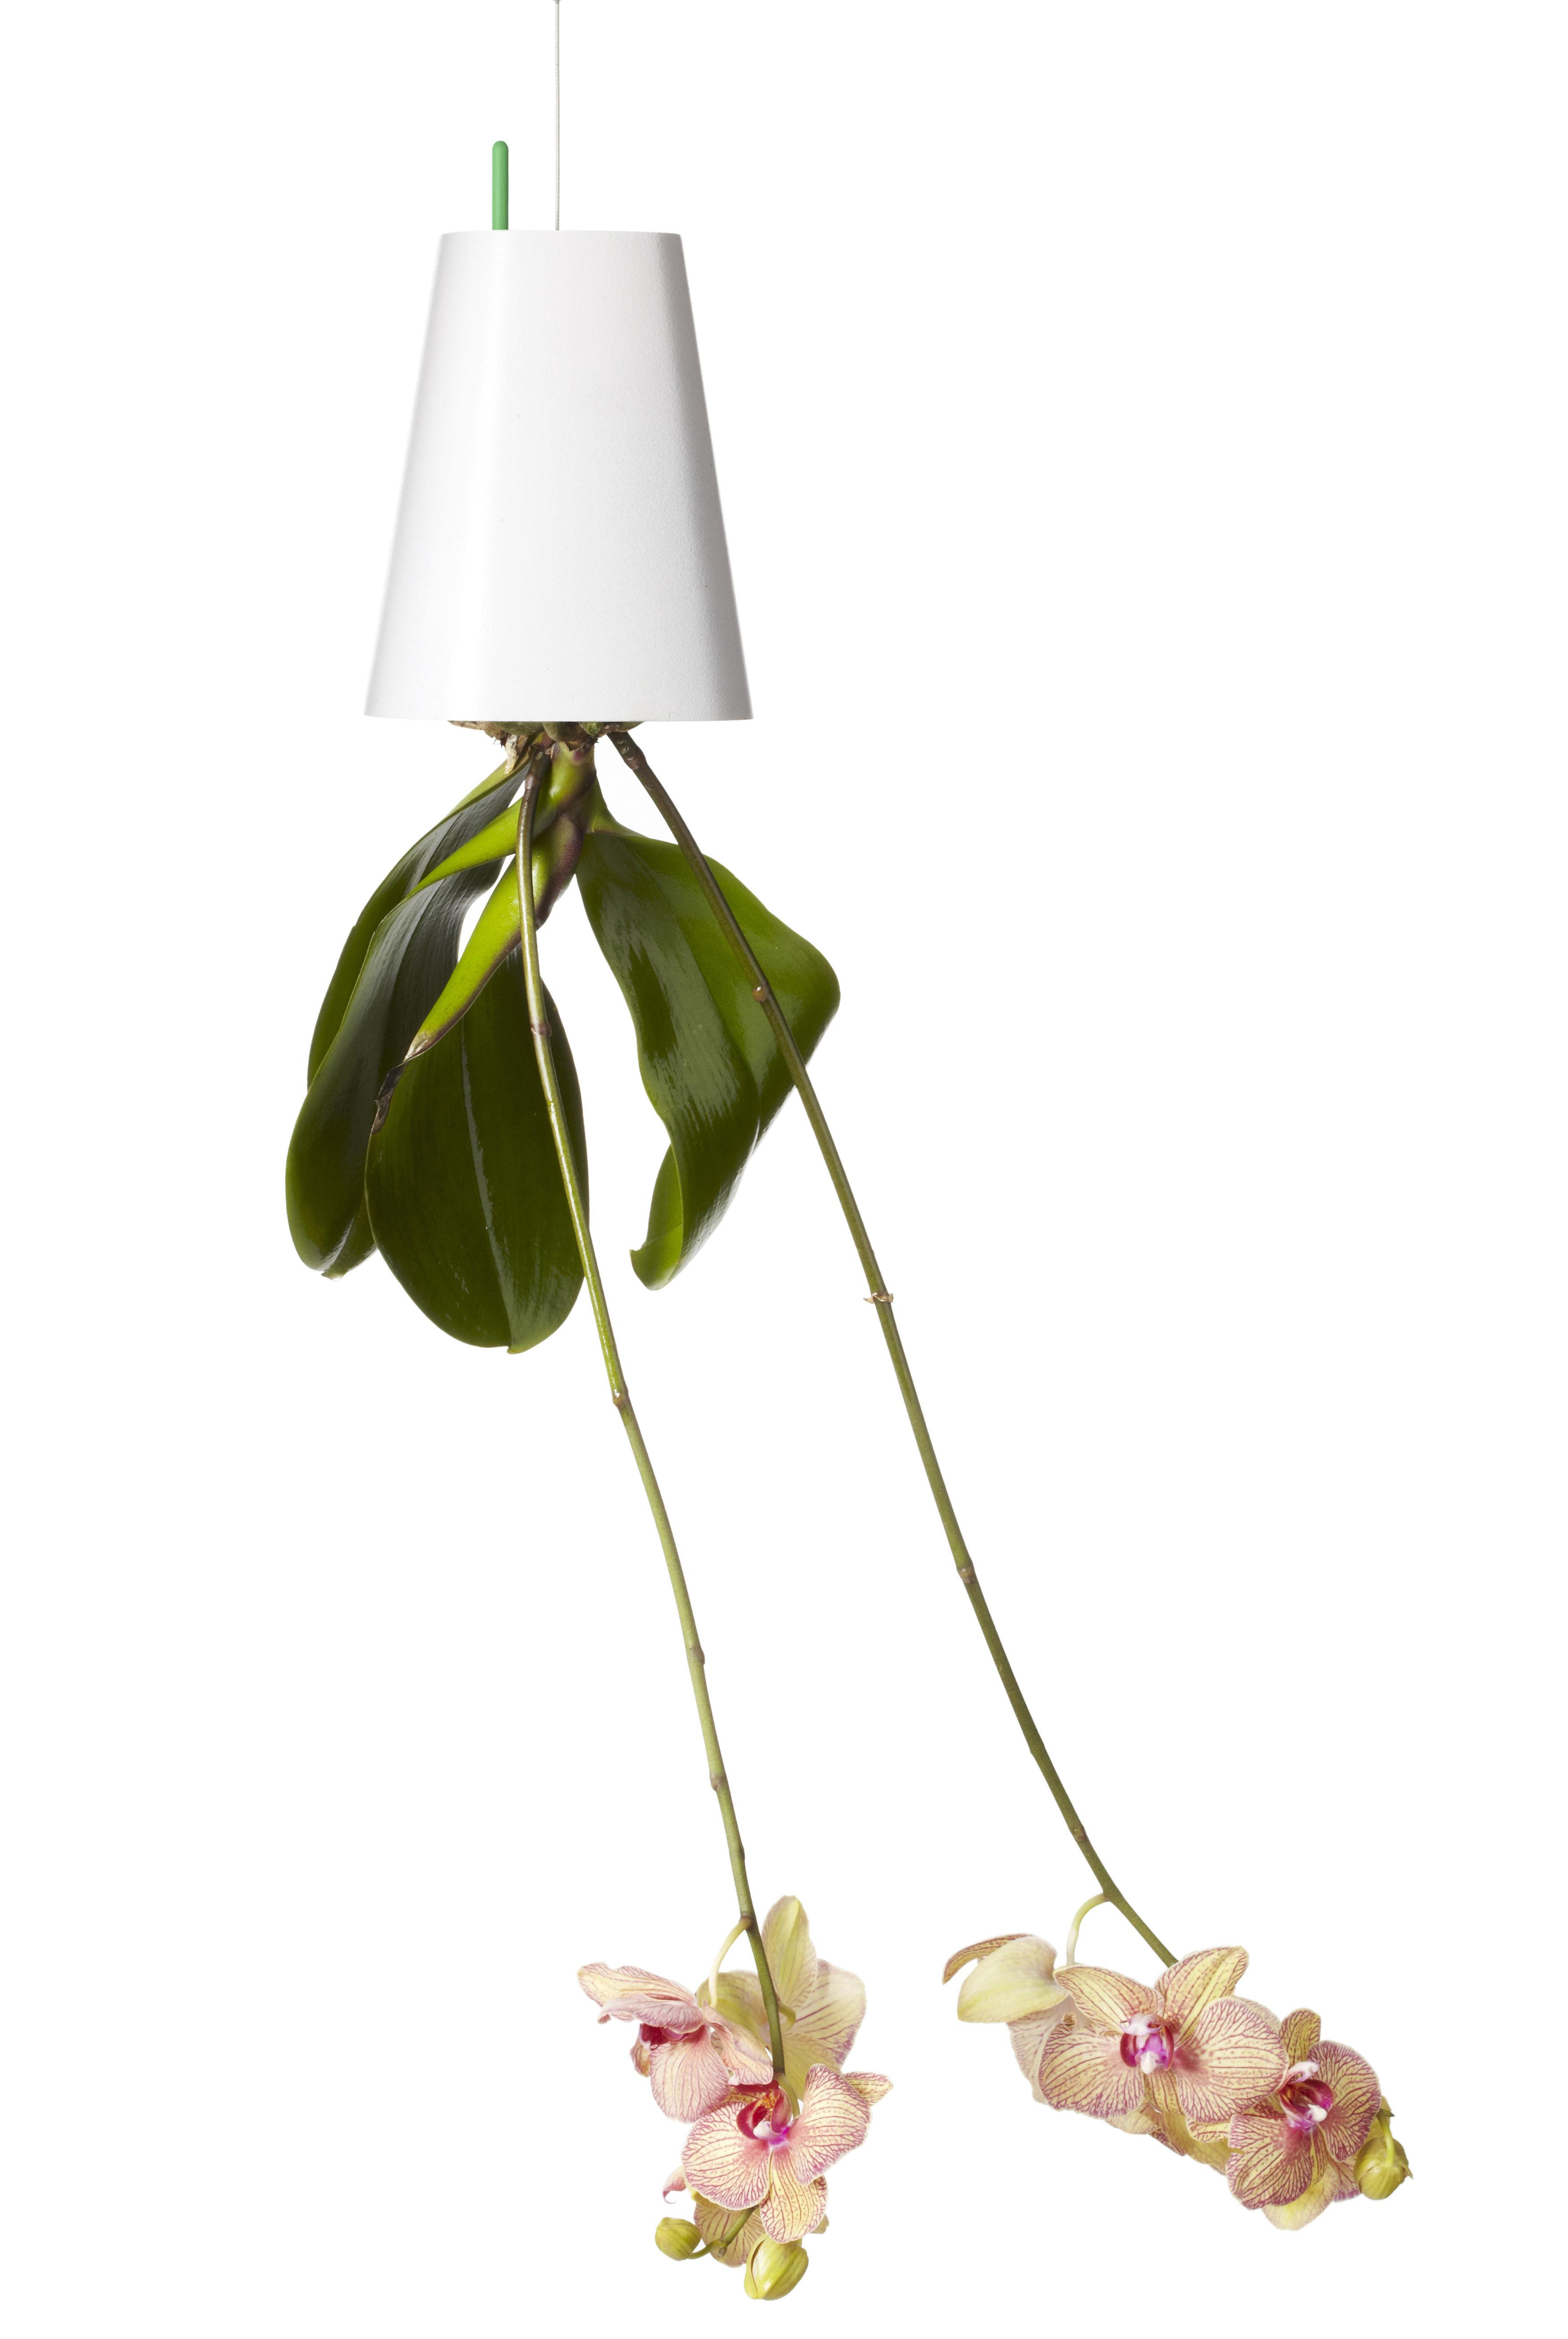 sky blumenkasten aus recyceltem polypropylen large h 25 cm zum aufh ngen wei by boskke. Black Bedroom Furniture Sets. Home Design Ideas